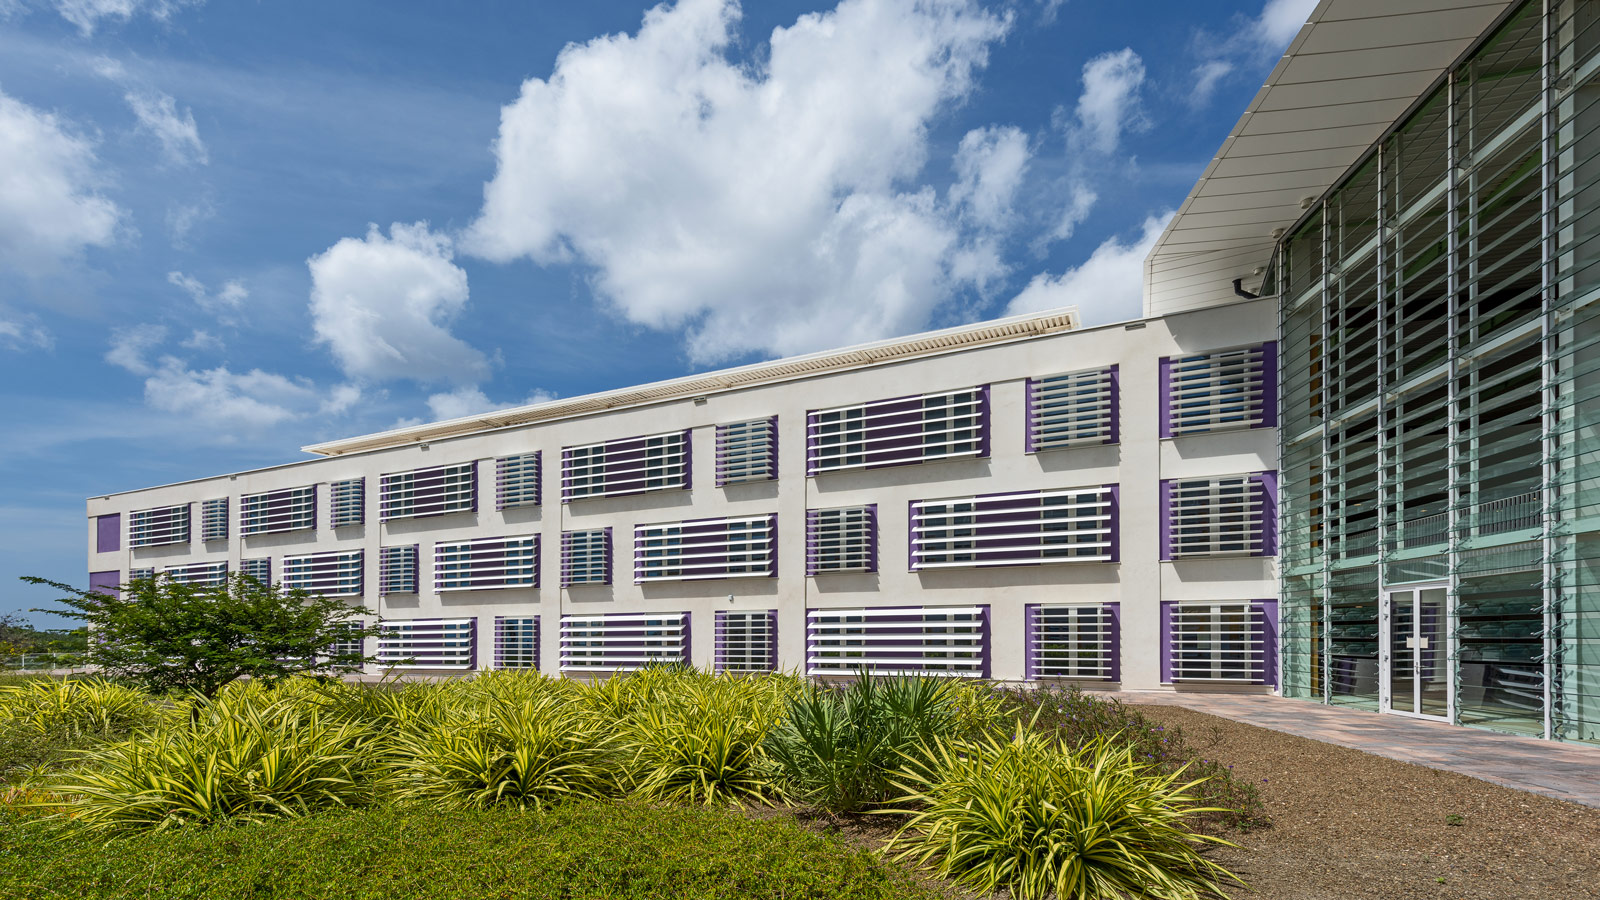 Curaçao Medical Center / Architecture by OZ Curaçao & EGM architecten